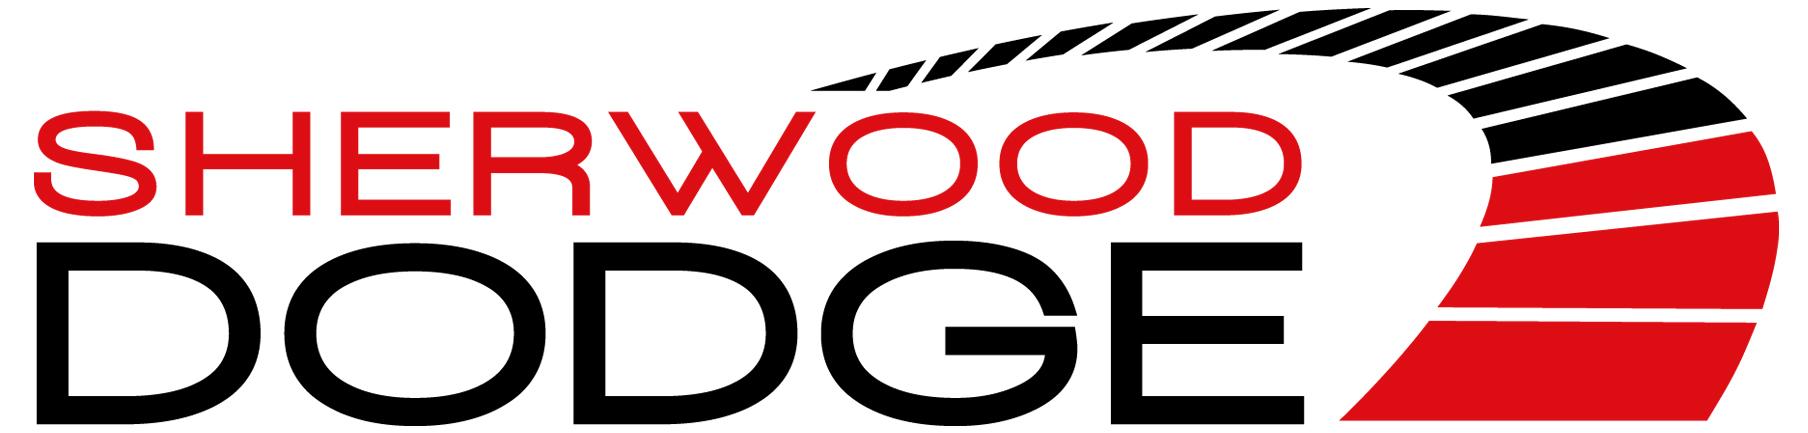 Sherwoood Dodge